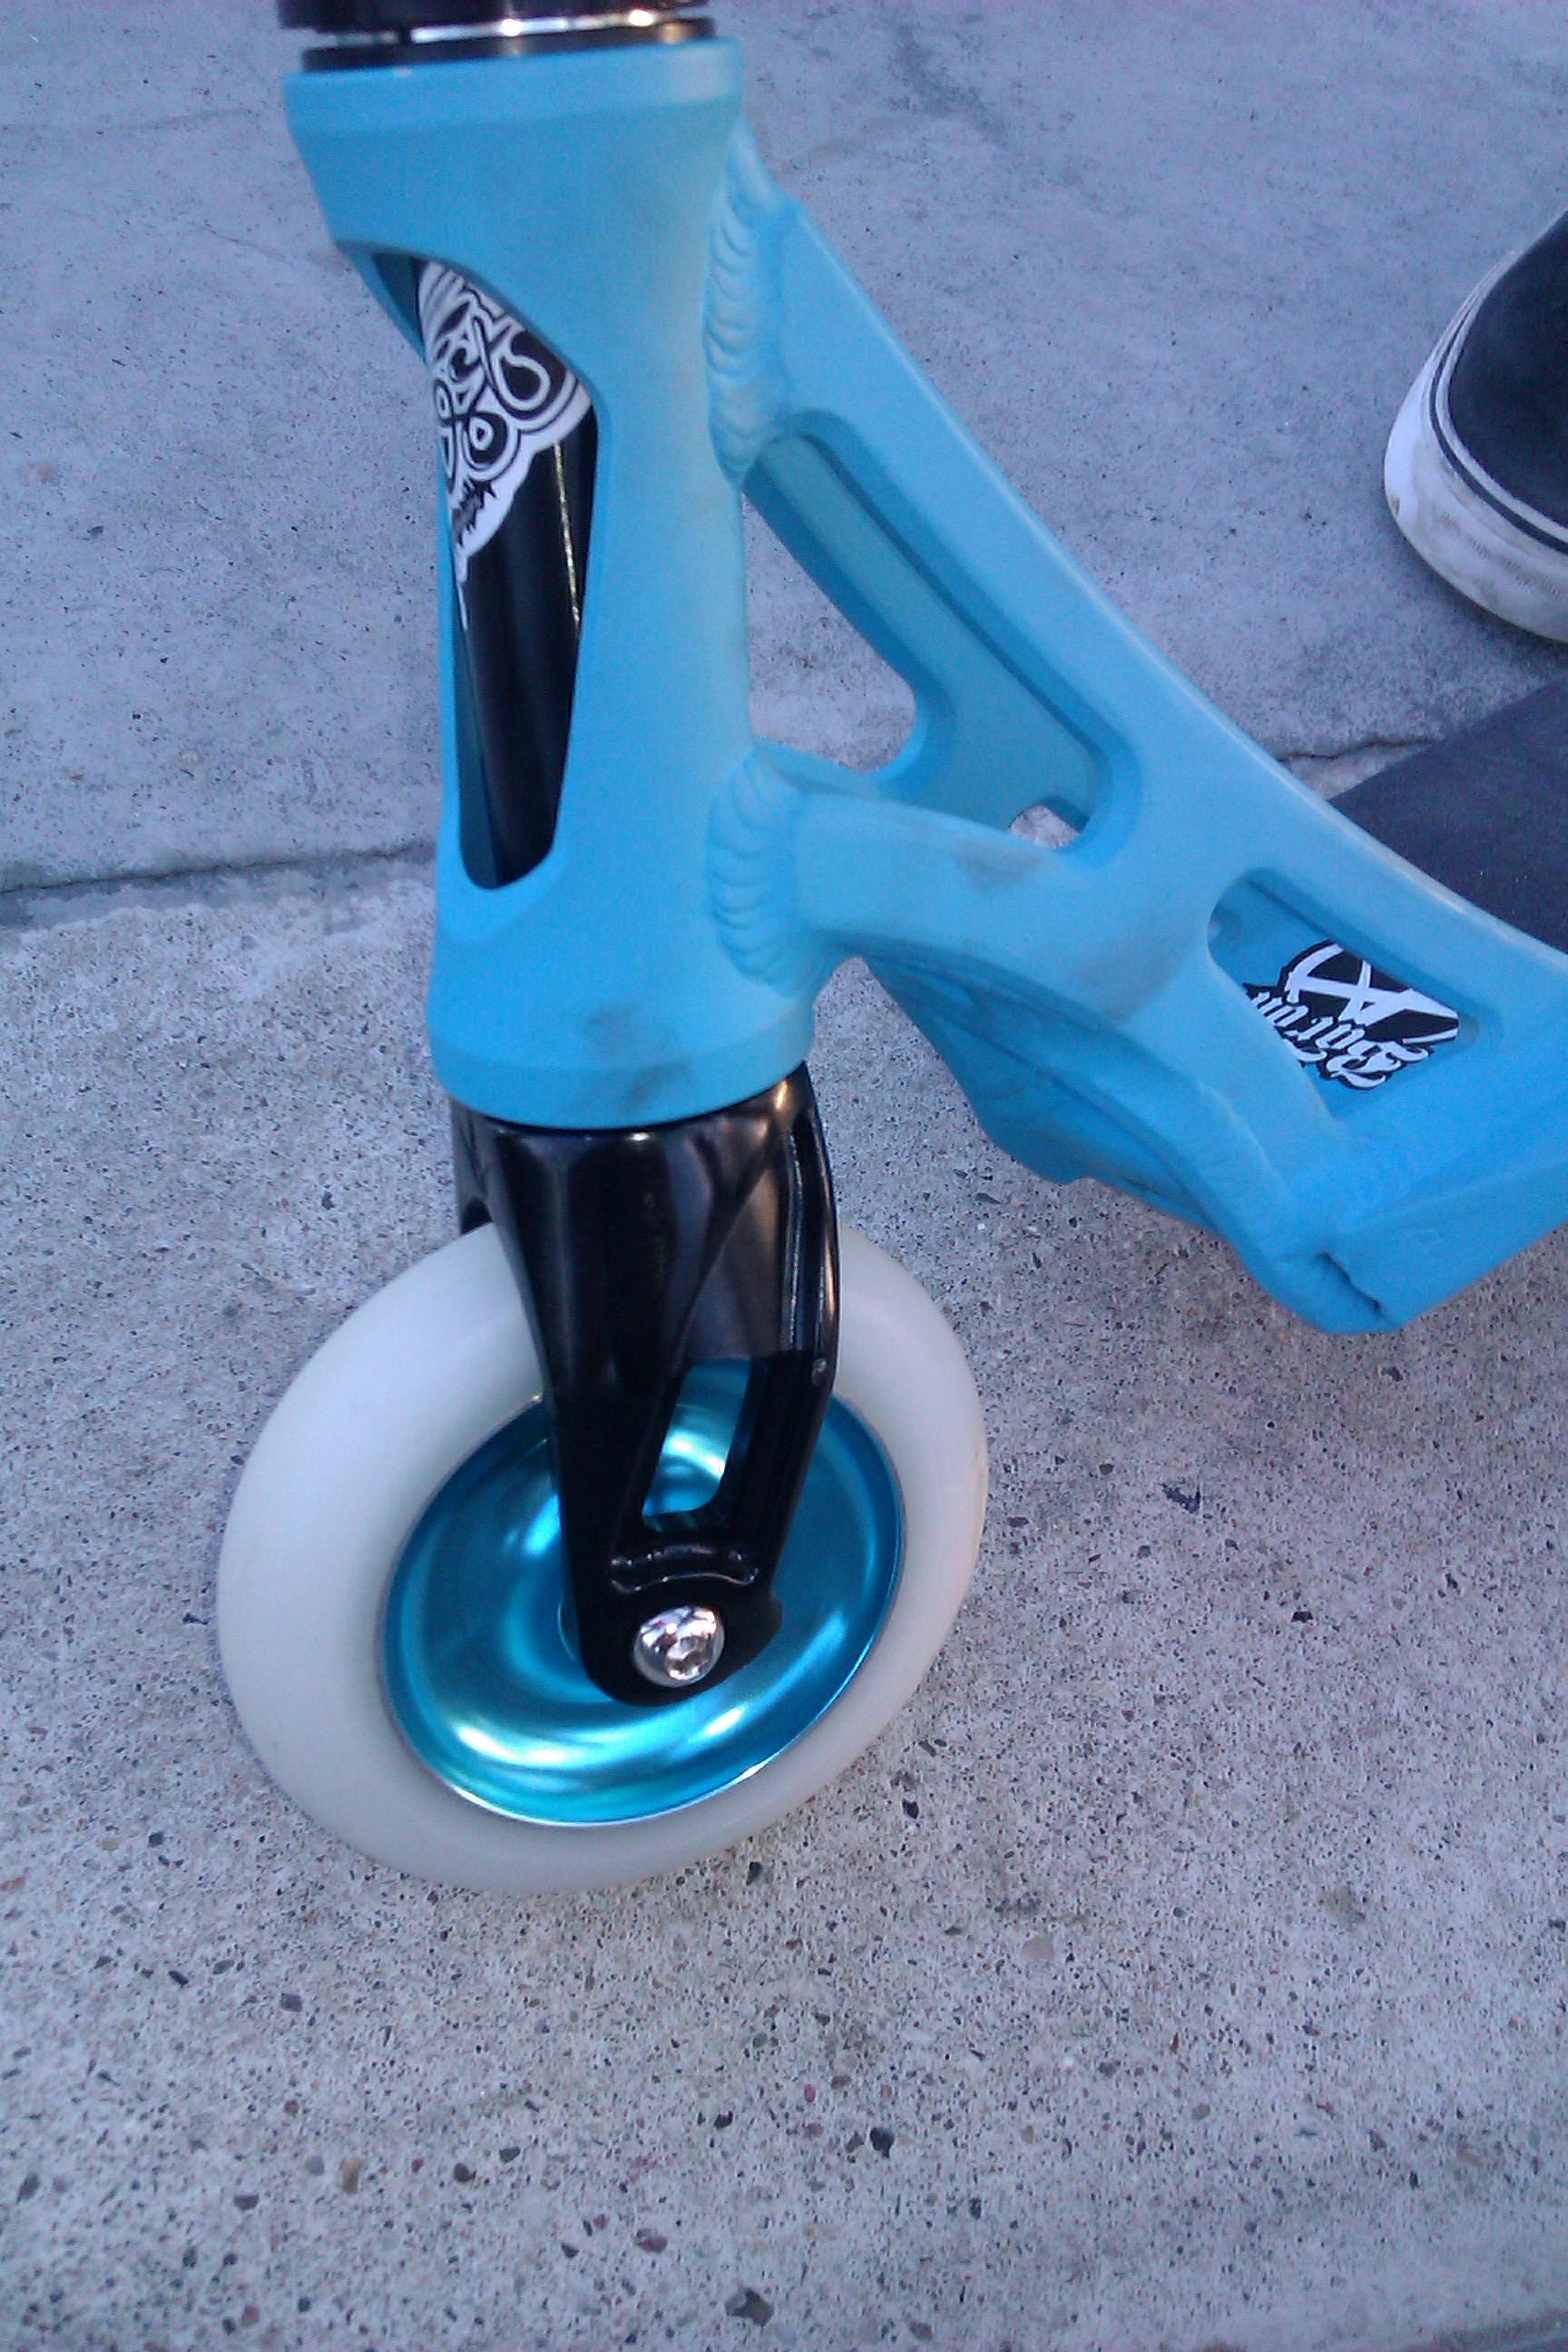 anaquada wheels addict deck. Black Bedroom Furniture Sets. Home Design Ideas